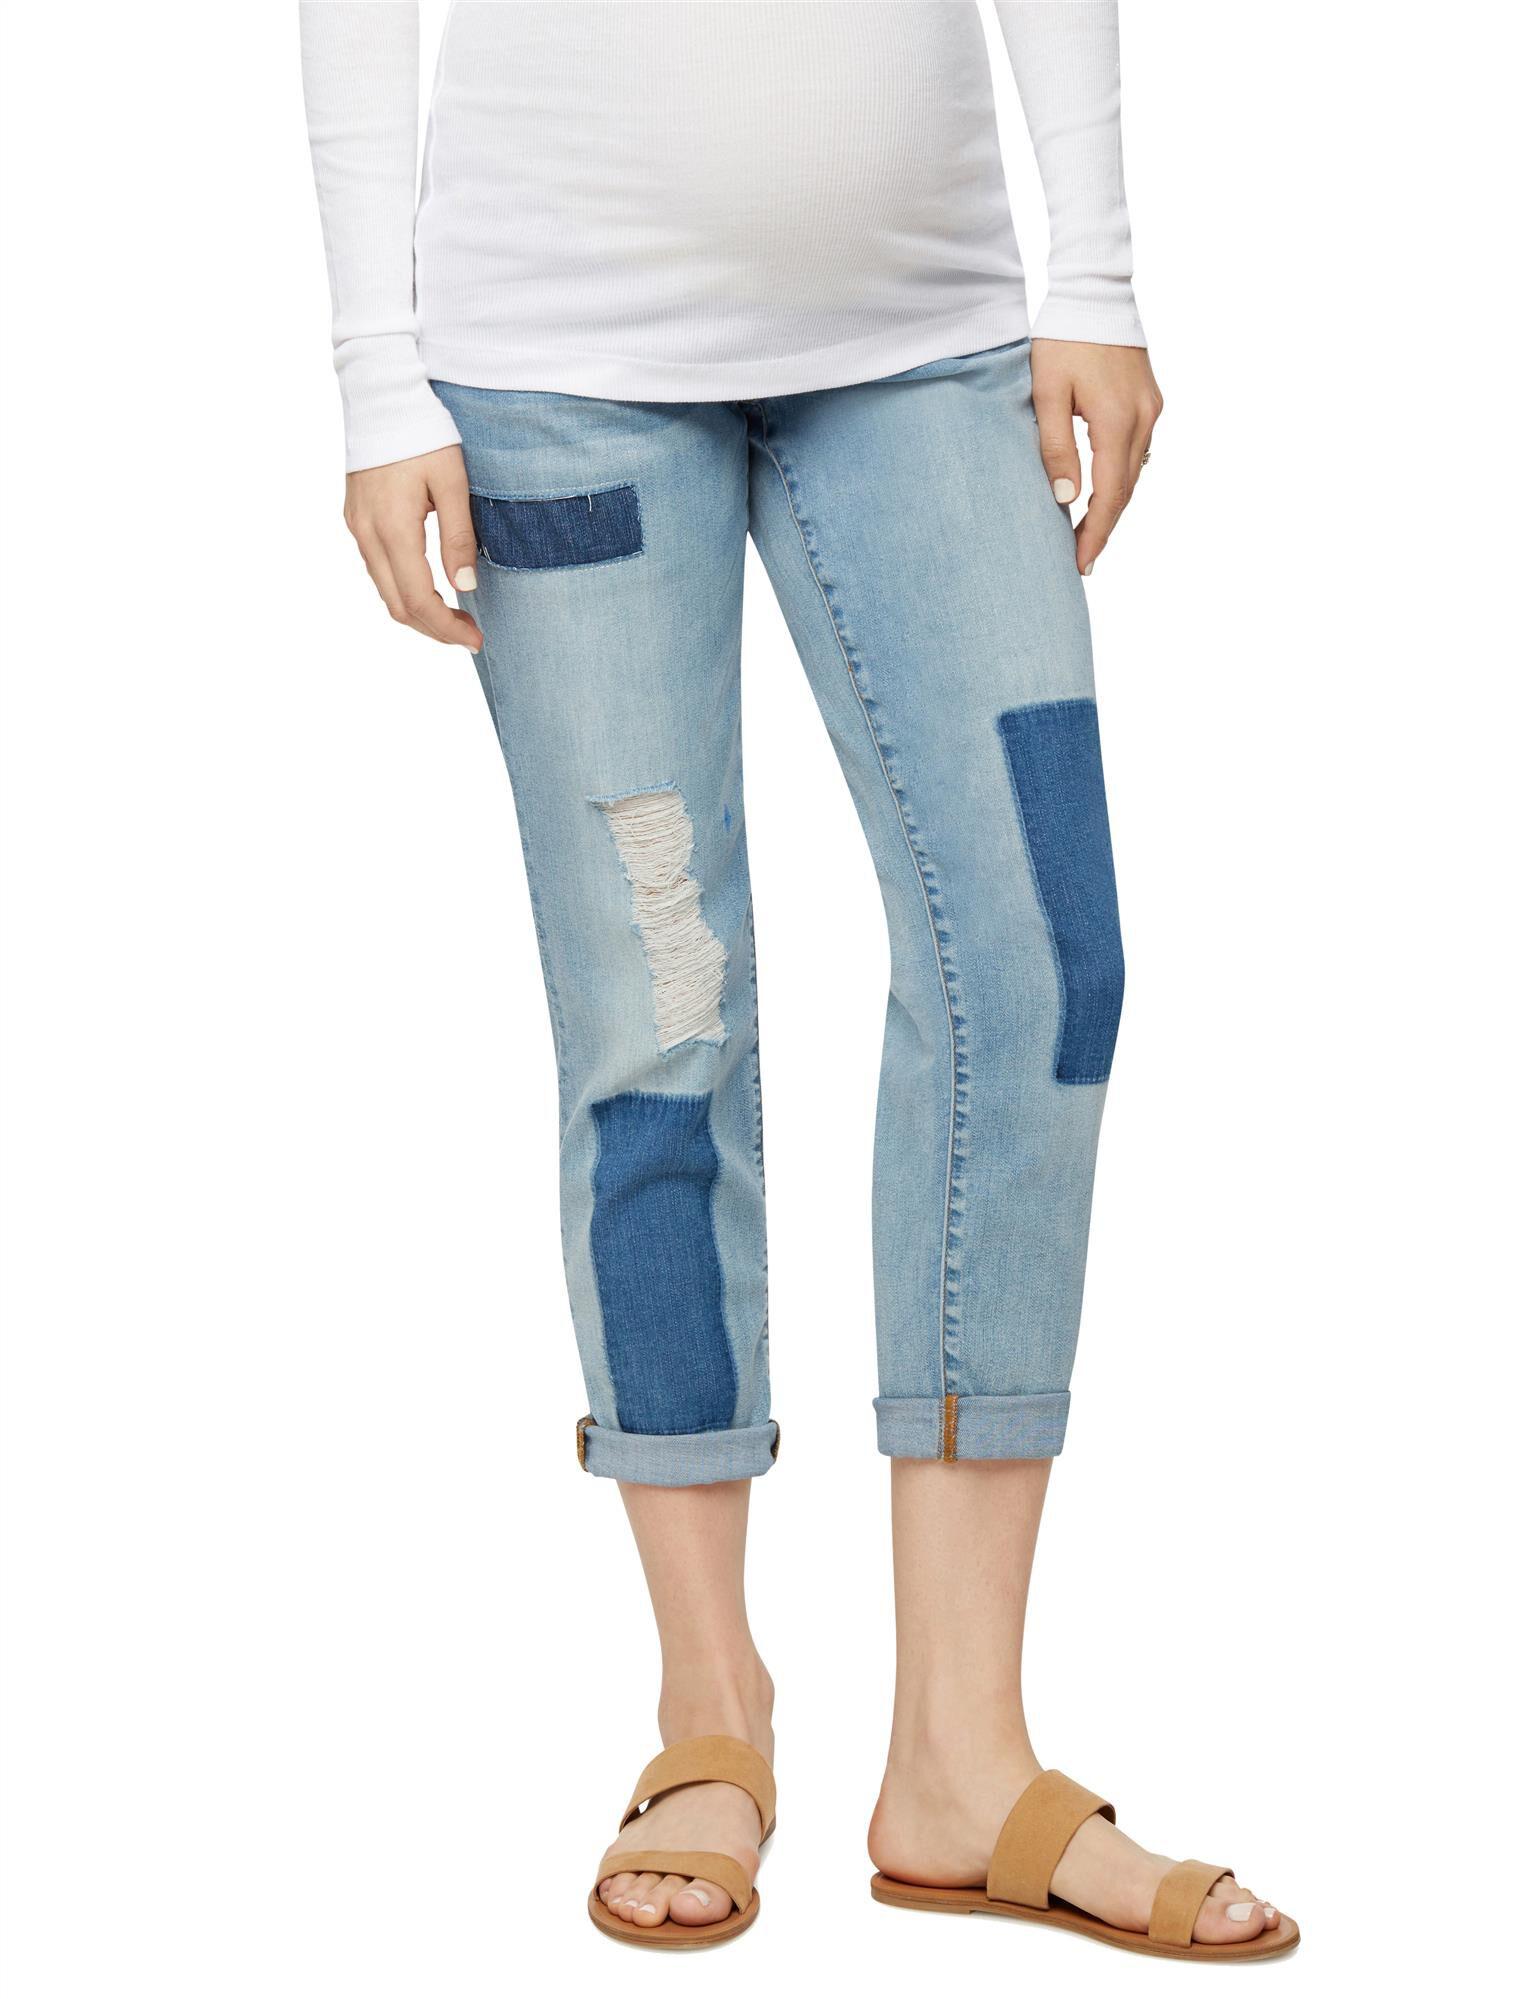 Luxe Essentials Denim Secret Fit Belly Patchwork Maternity Boyfriend Jeans